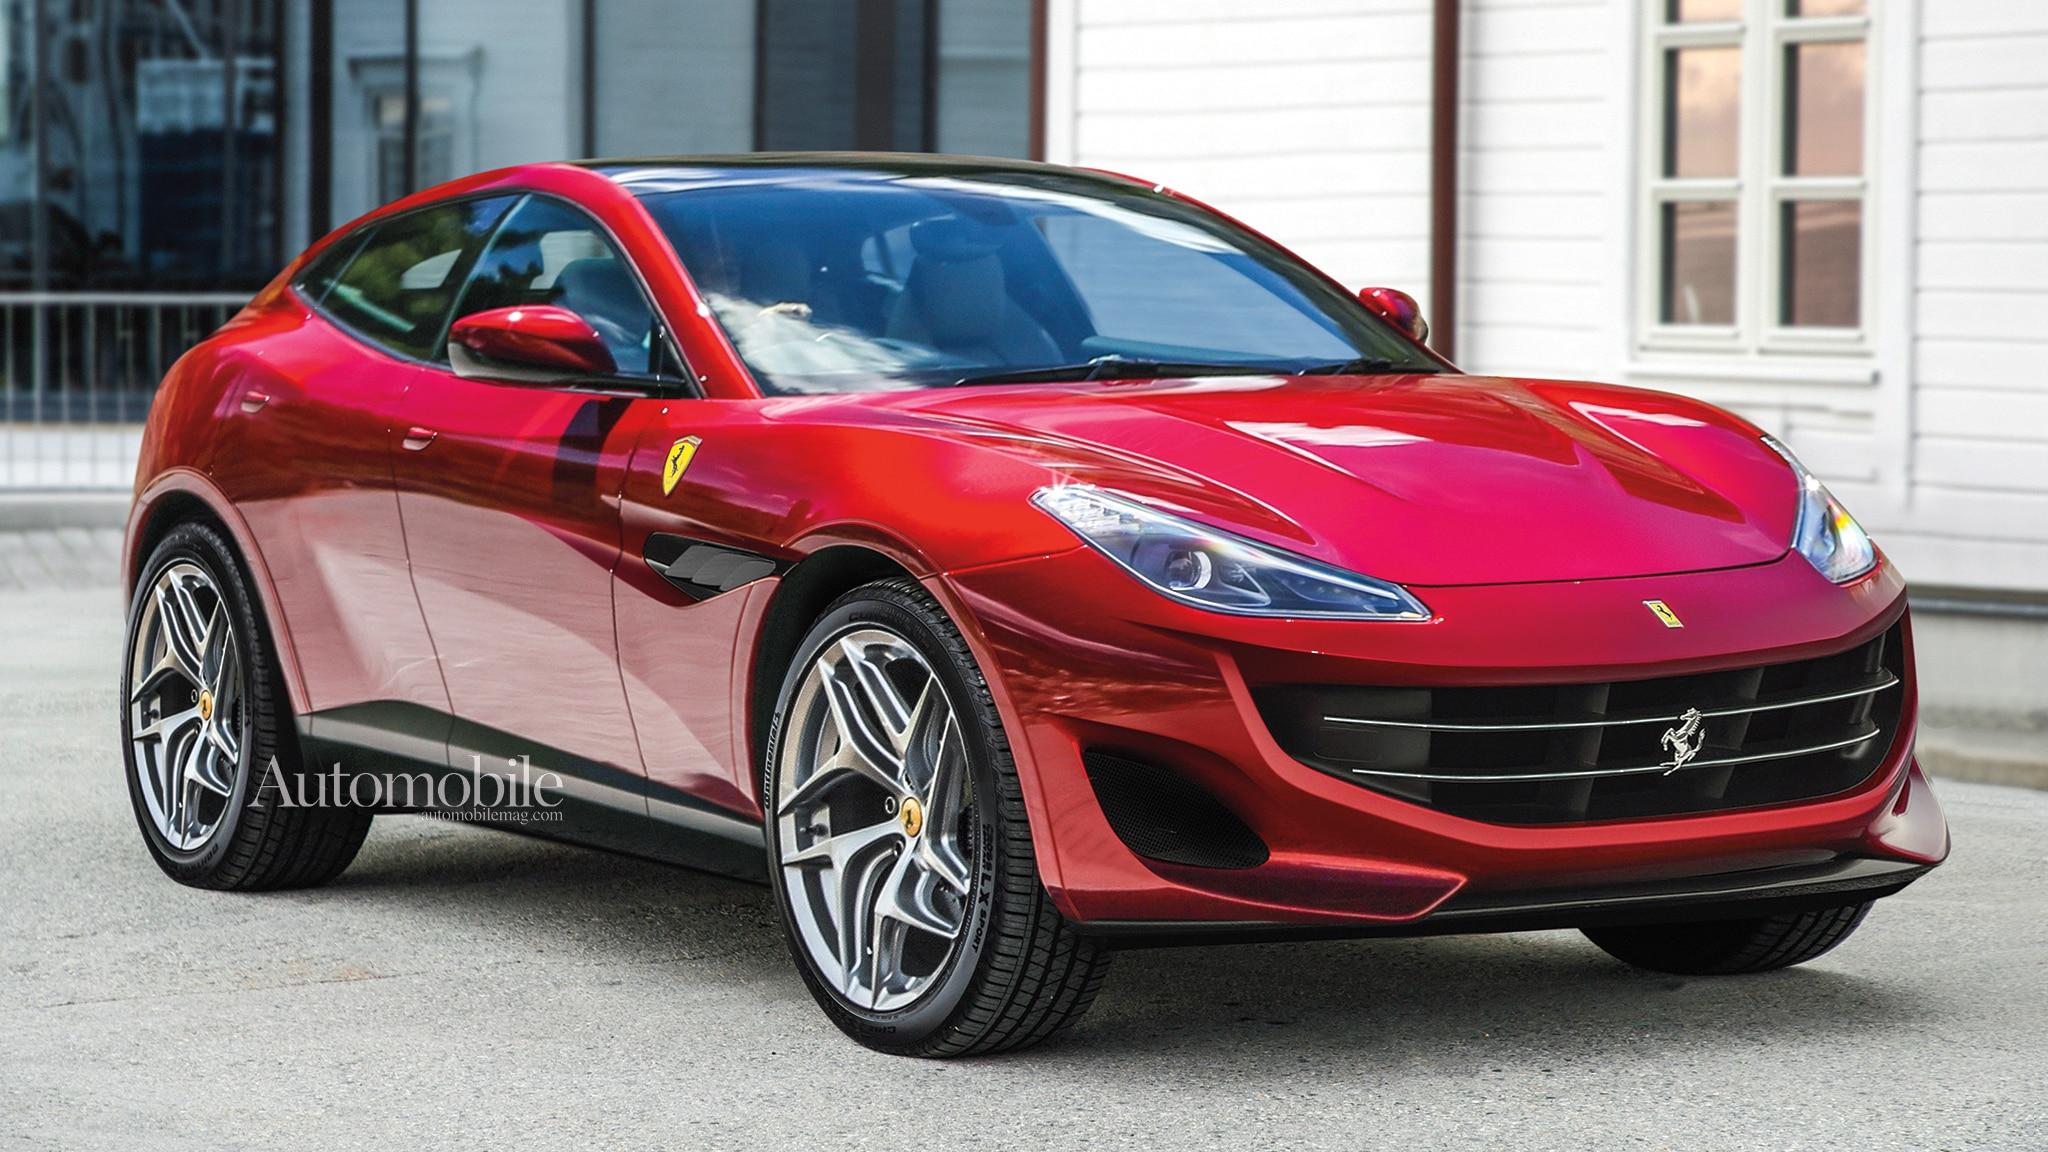 2022 Ferrari Purosangue Suv Renderings Rumors